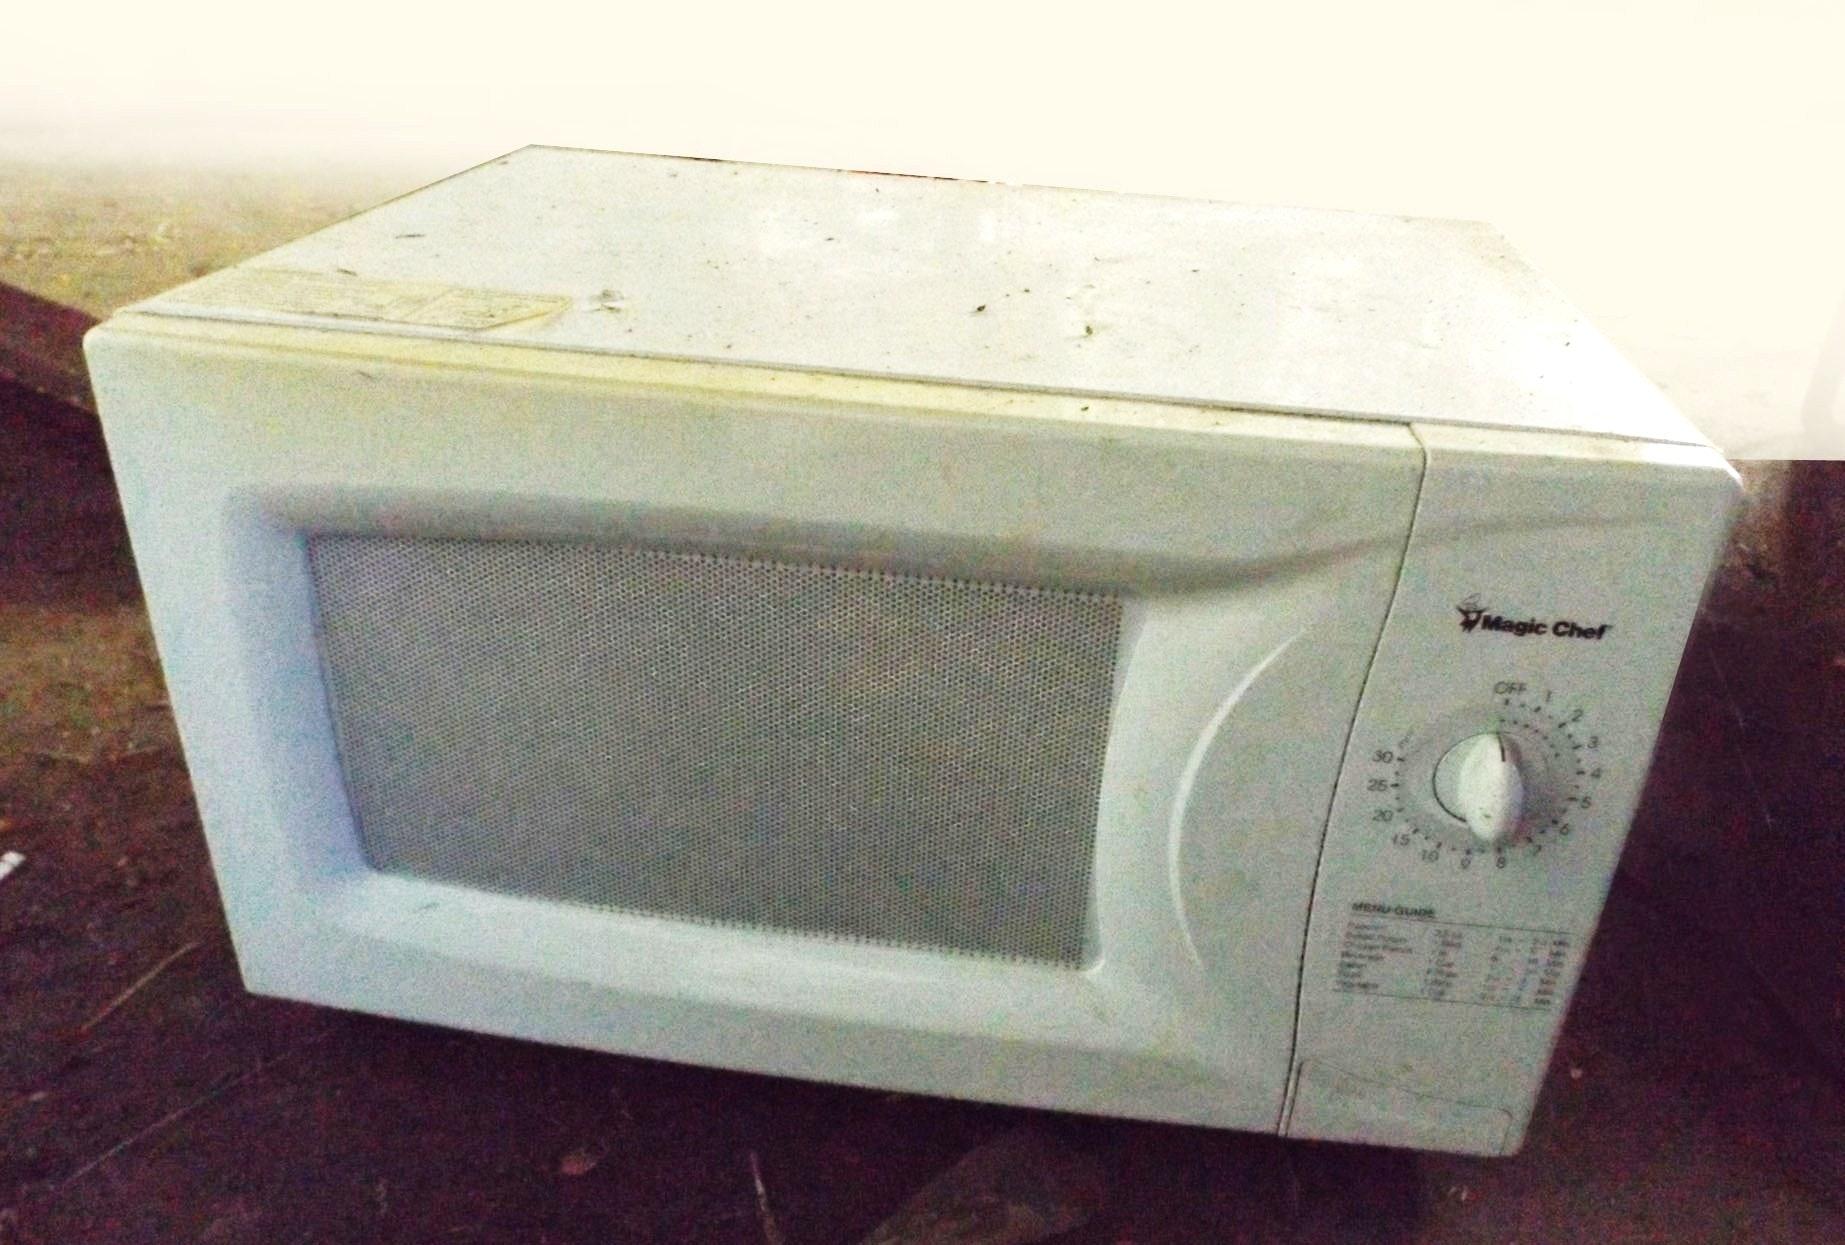 magic chef microwave oven - Magic Chef Oven